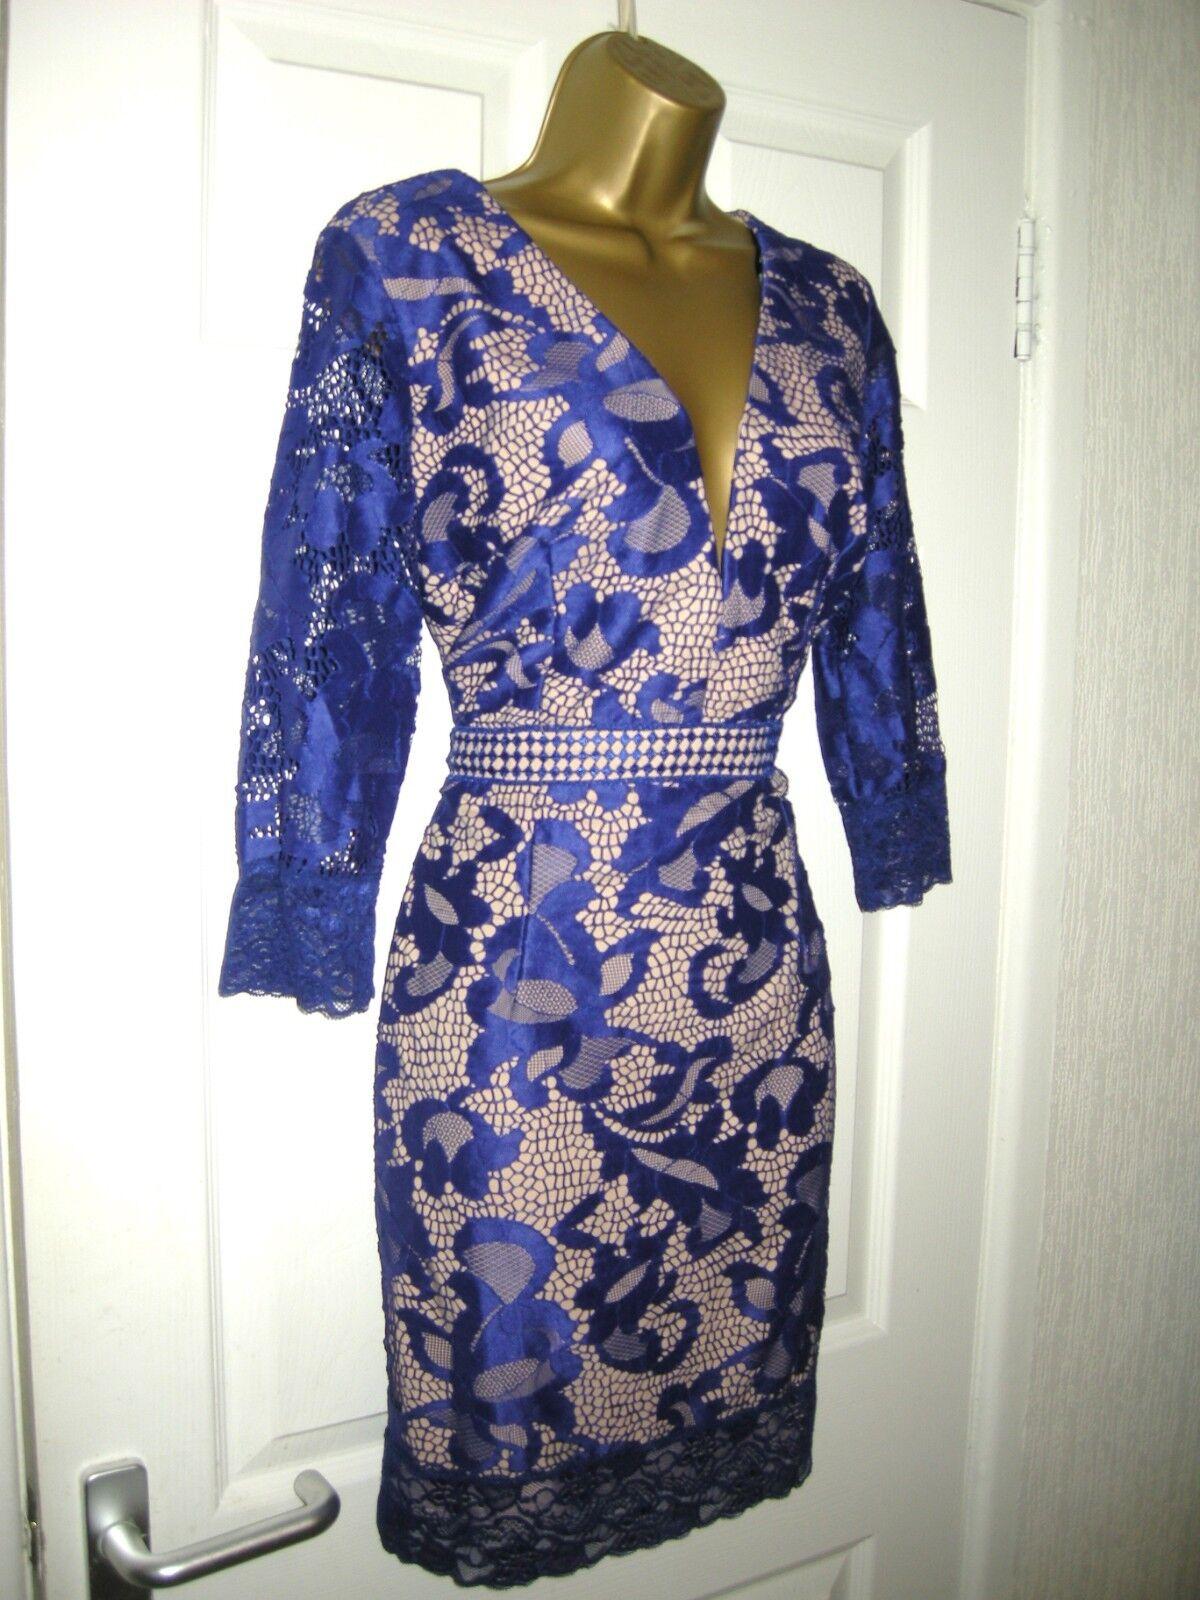 16 LITTLE MISTRESS blueE LACE MINI DRESS PLUNGE FRONT WEDDING HOLIDAYS CLASSY NEW